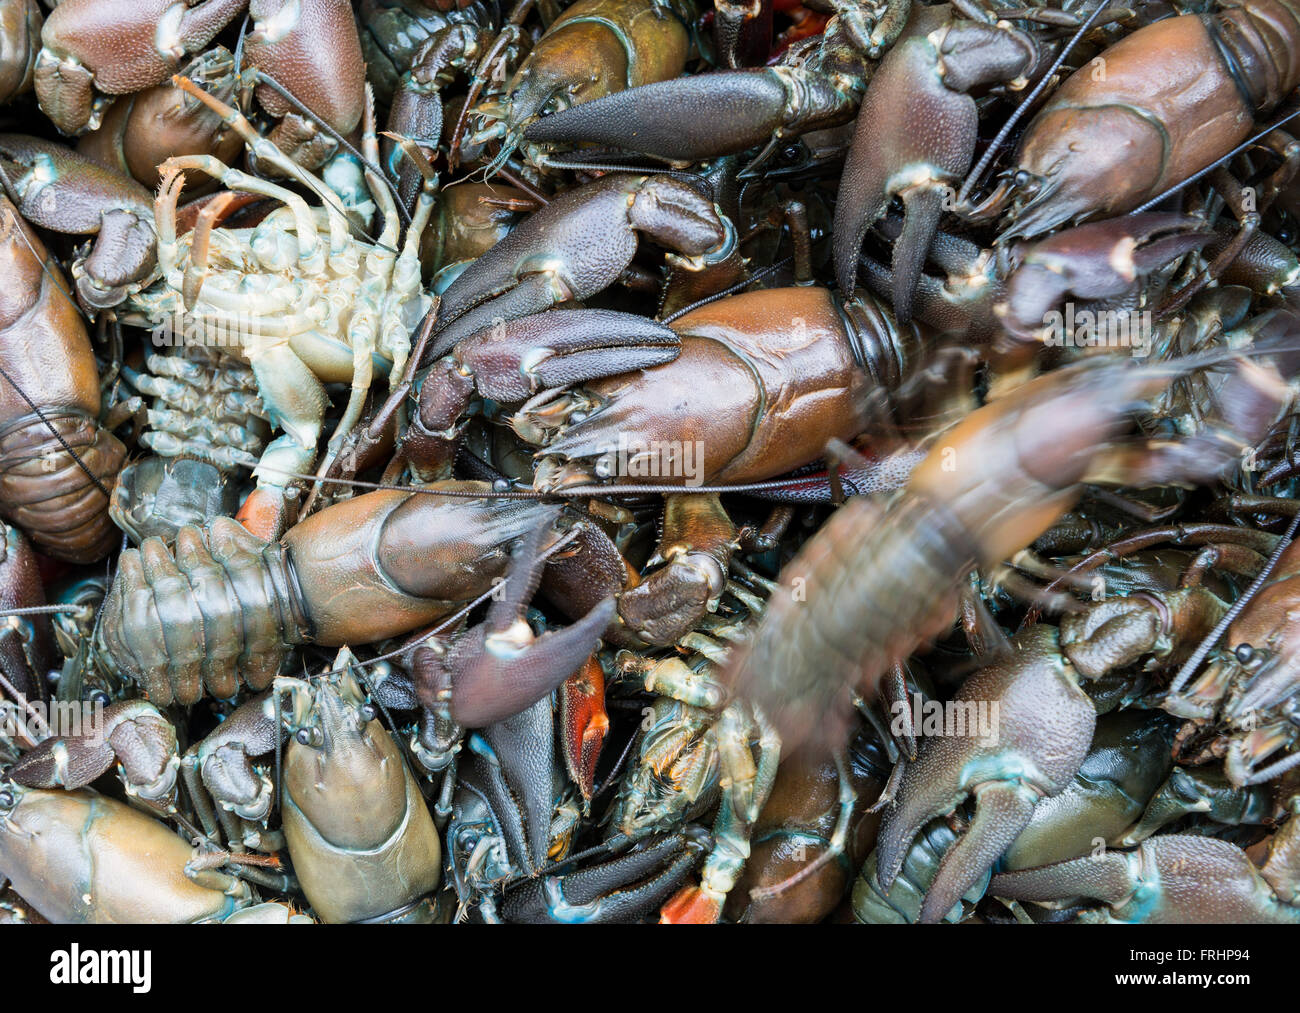 Living crayfish - Stock Image